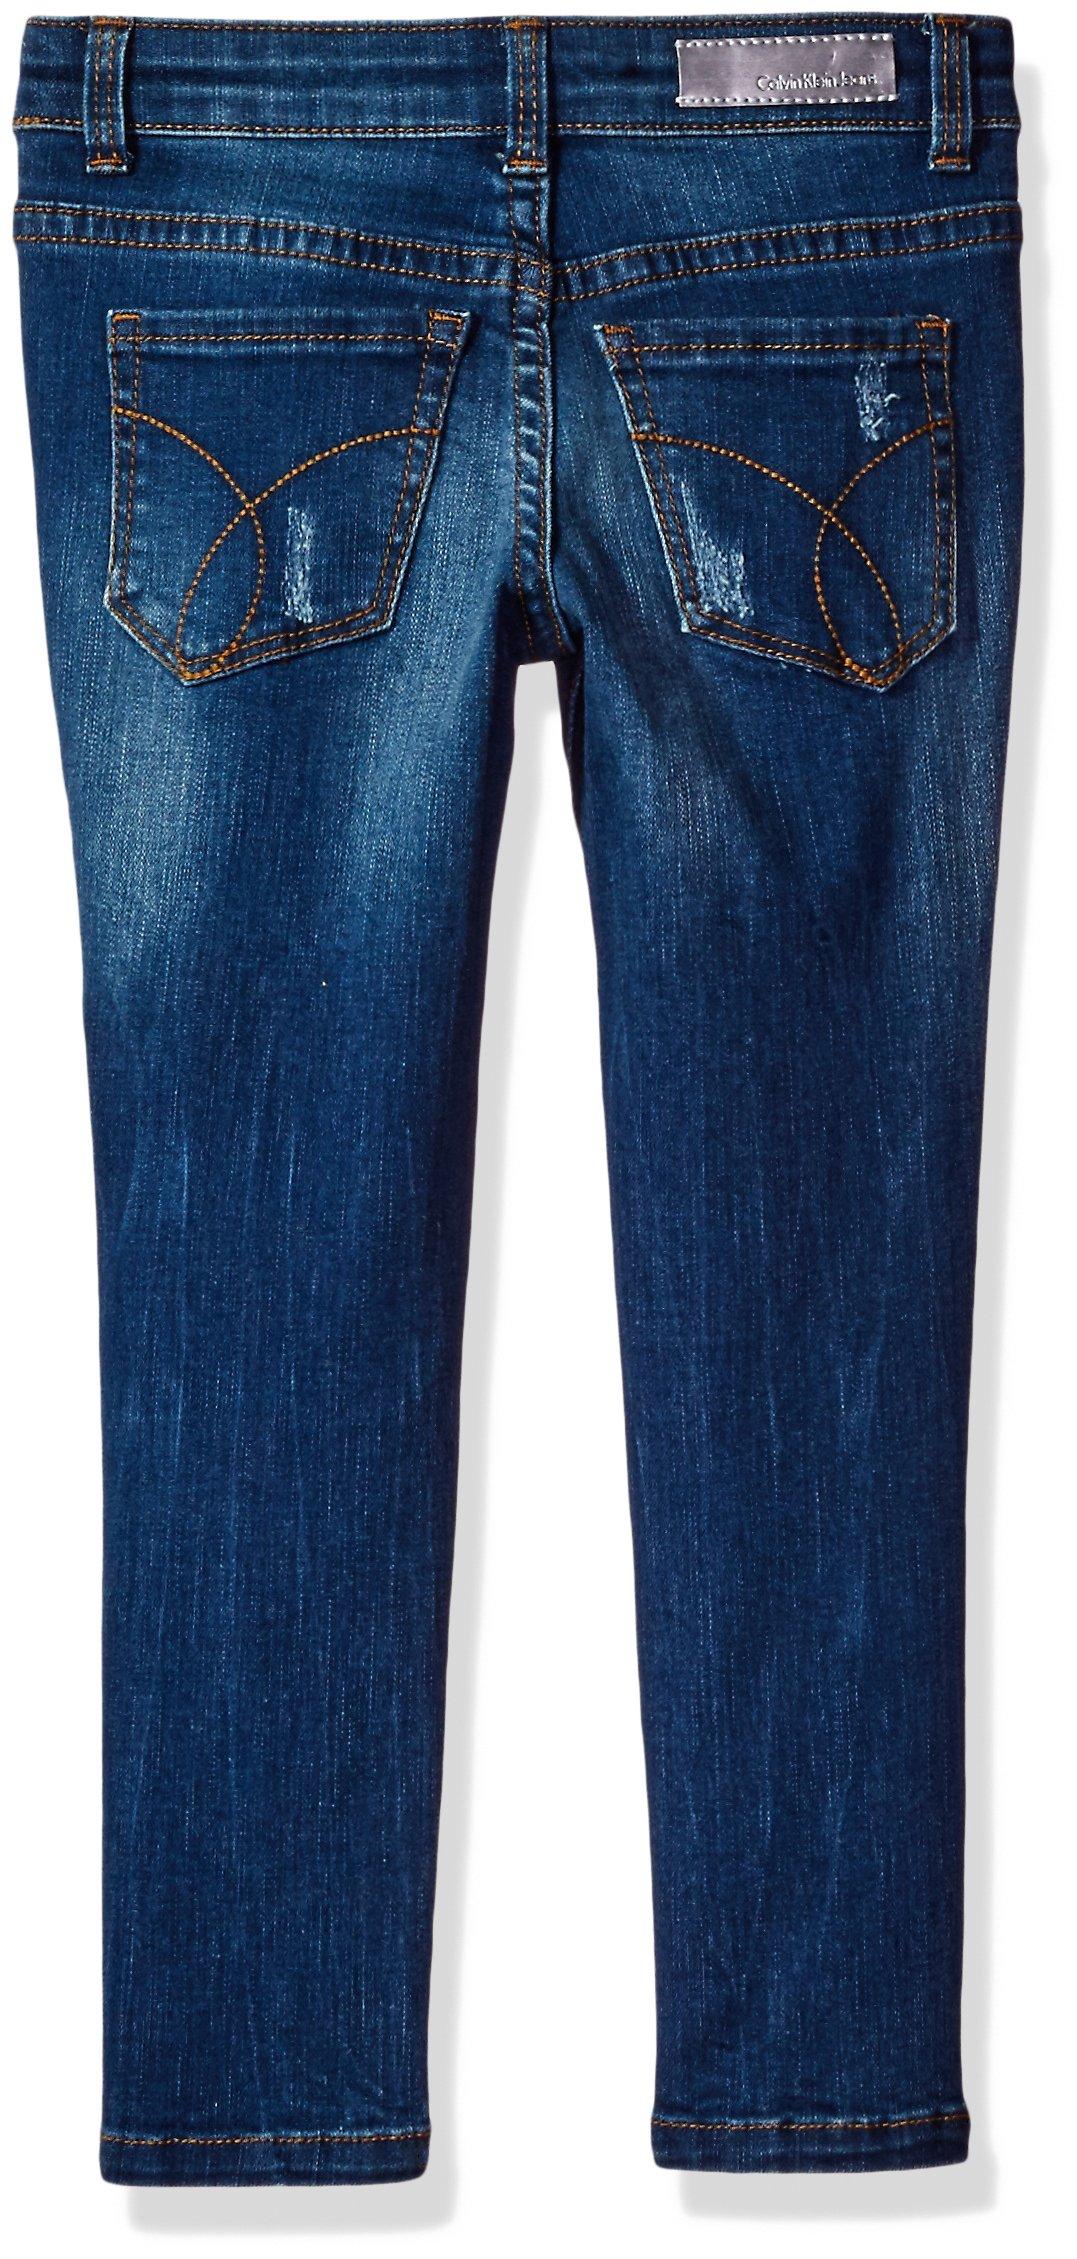 Calvin Klein Girls' Toddler Patchwork Ankle Skinny Jean, Pathwork, 3T by Calvin Klein Jeans (Image #2)